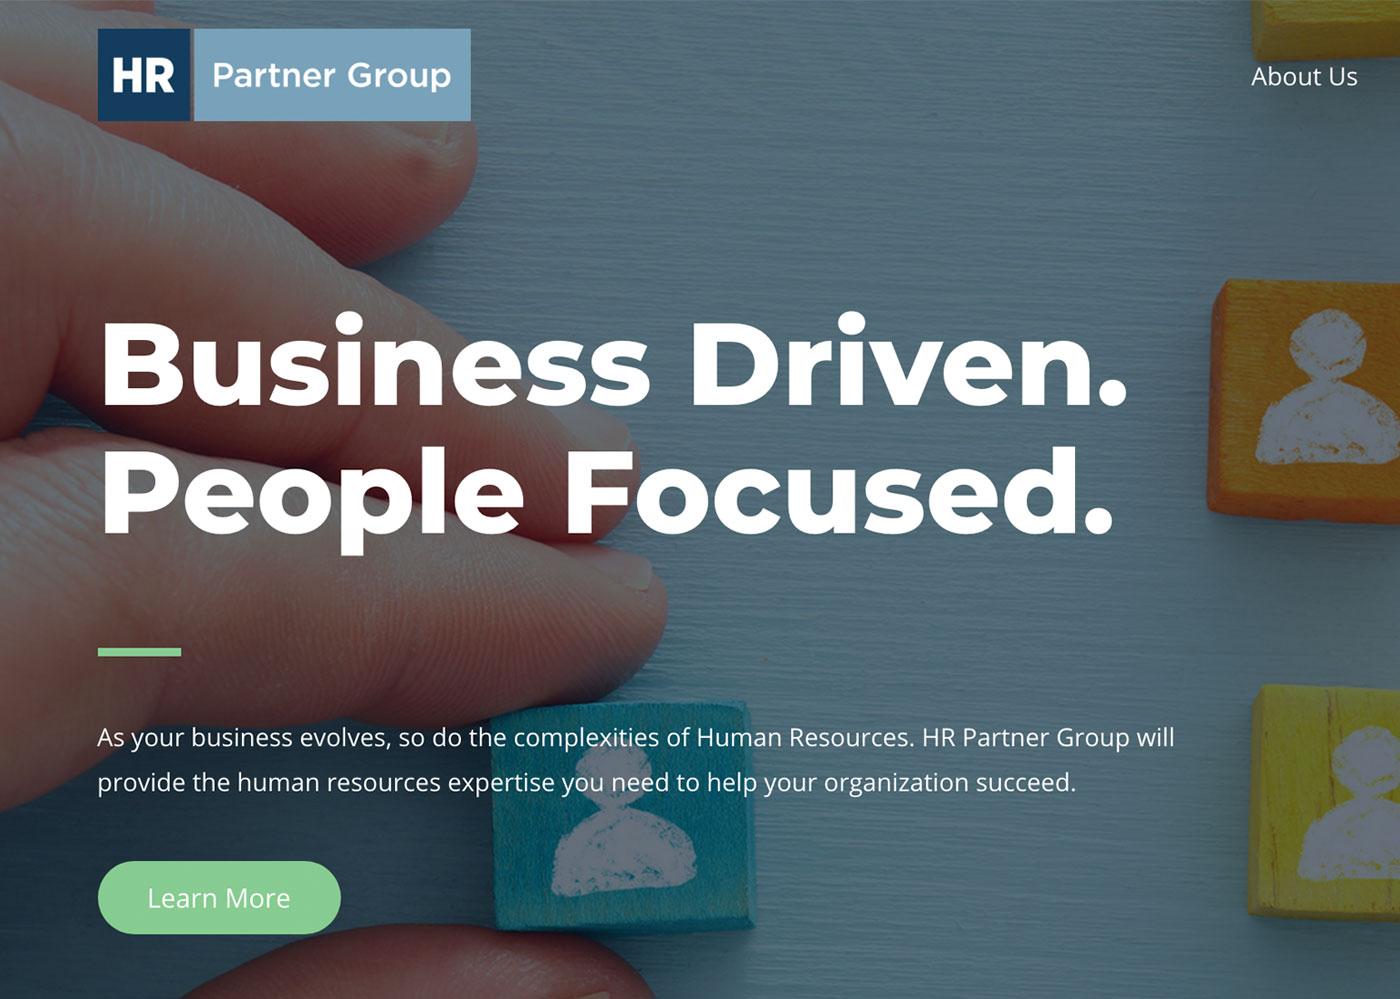 HR partner group